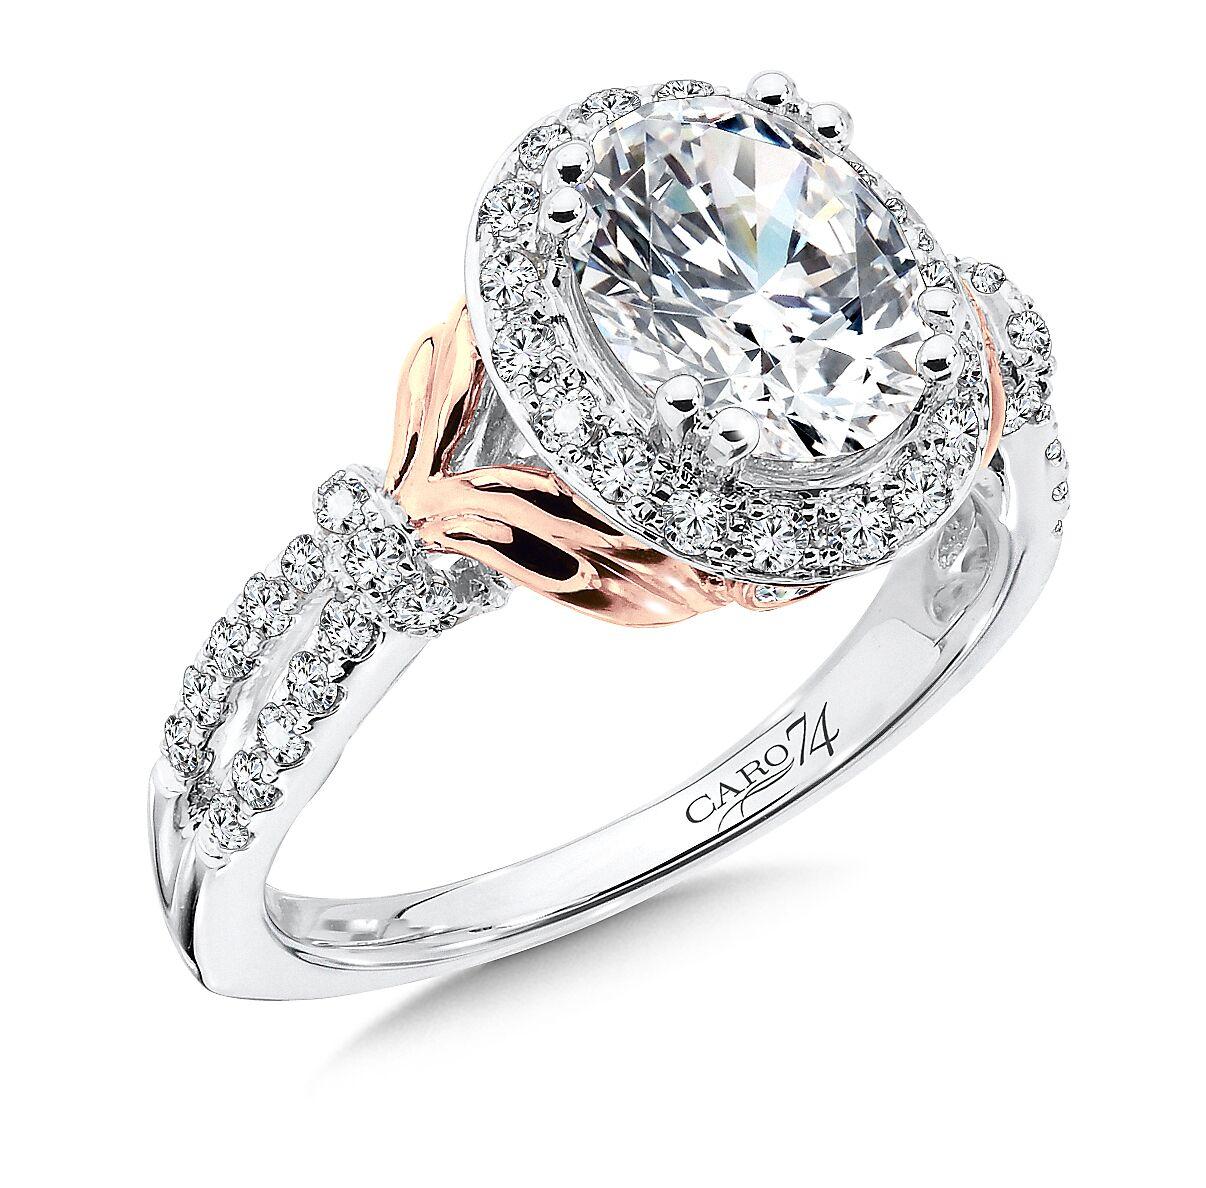 Custom Oval Diamond Ring 5, Shira Diamonds